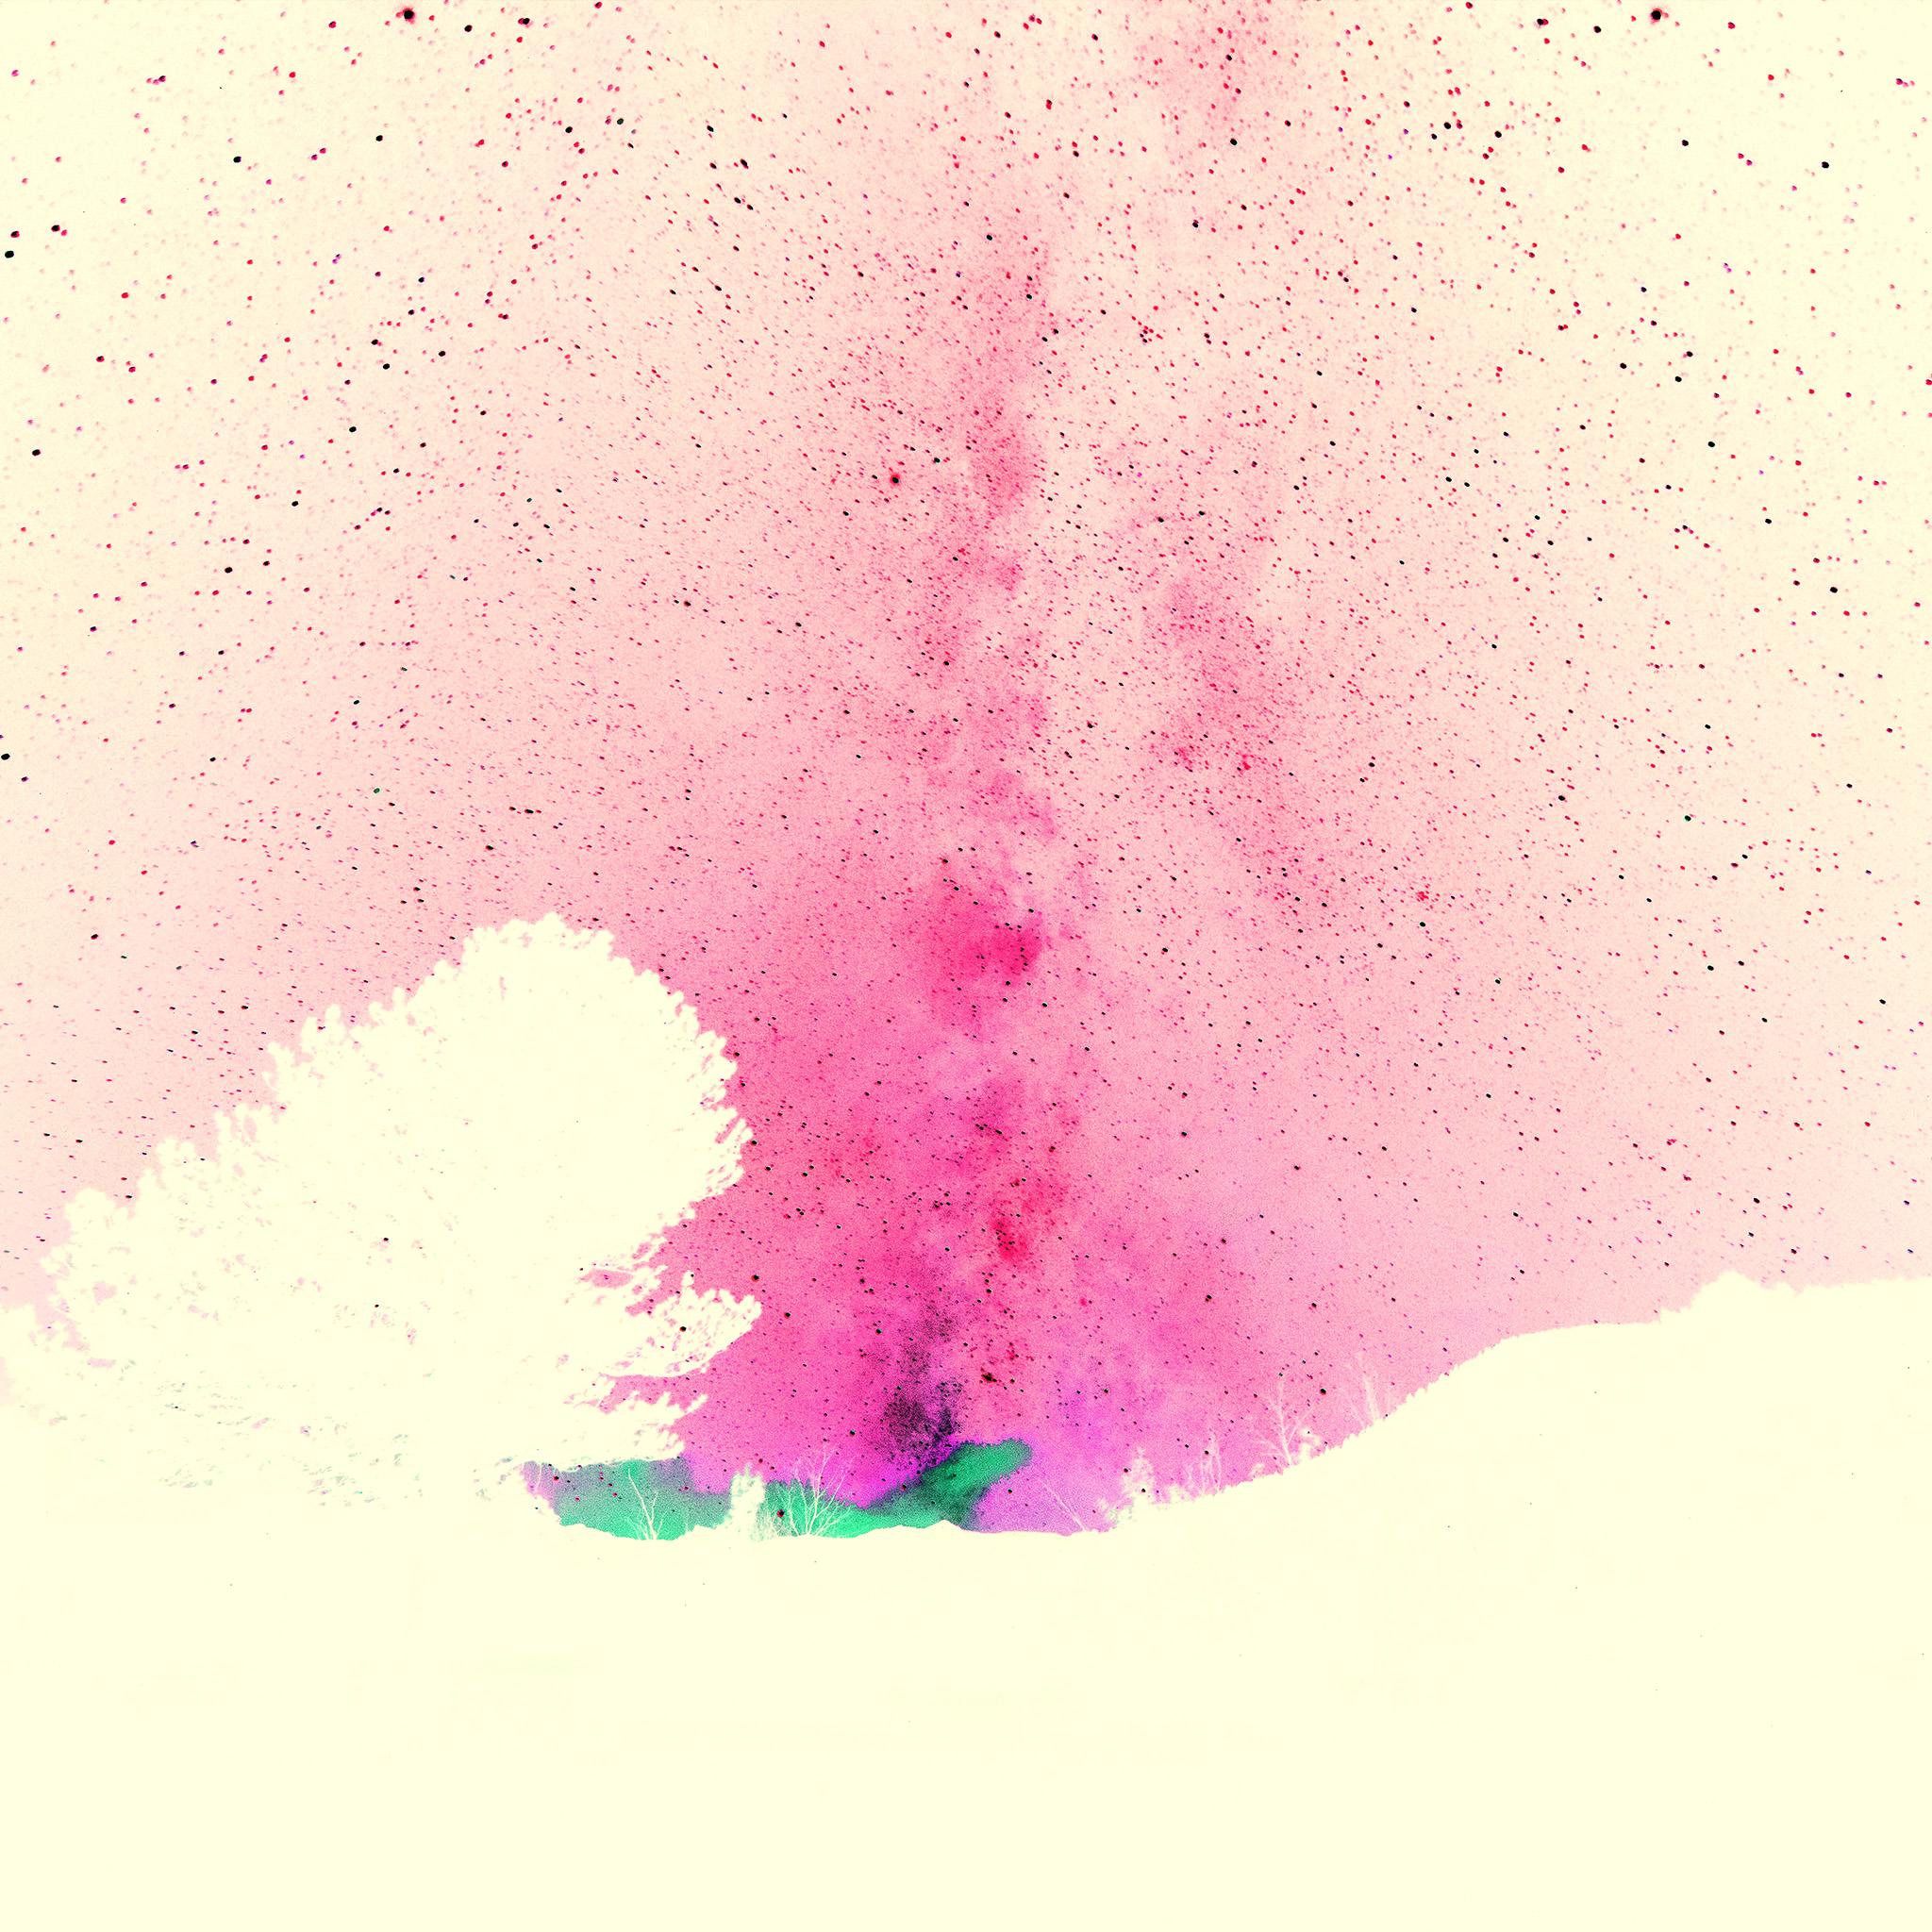 Iphone Wallpaper Pink: WALLPAPERS